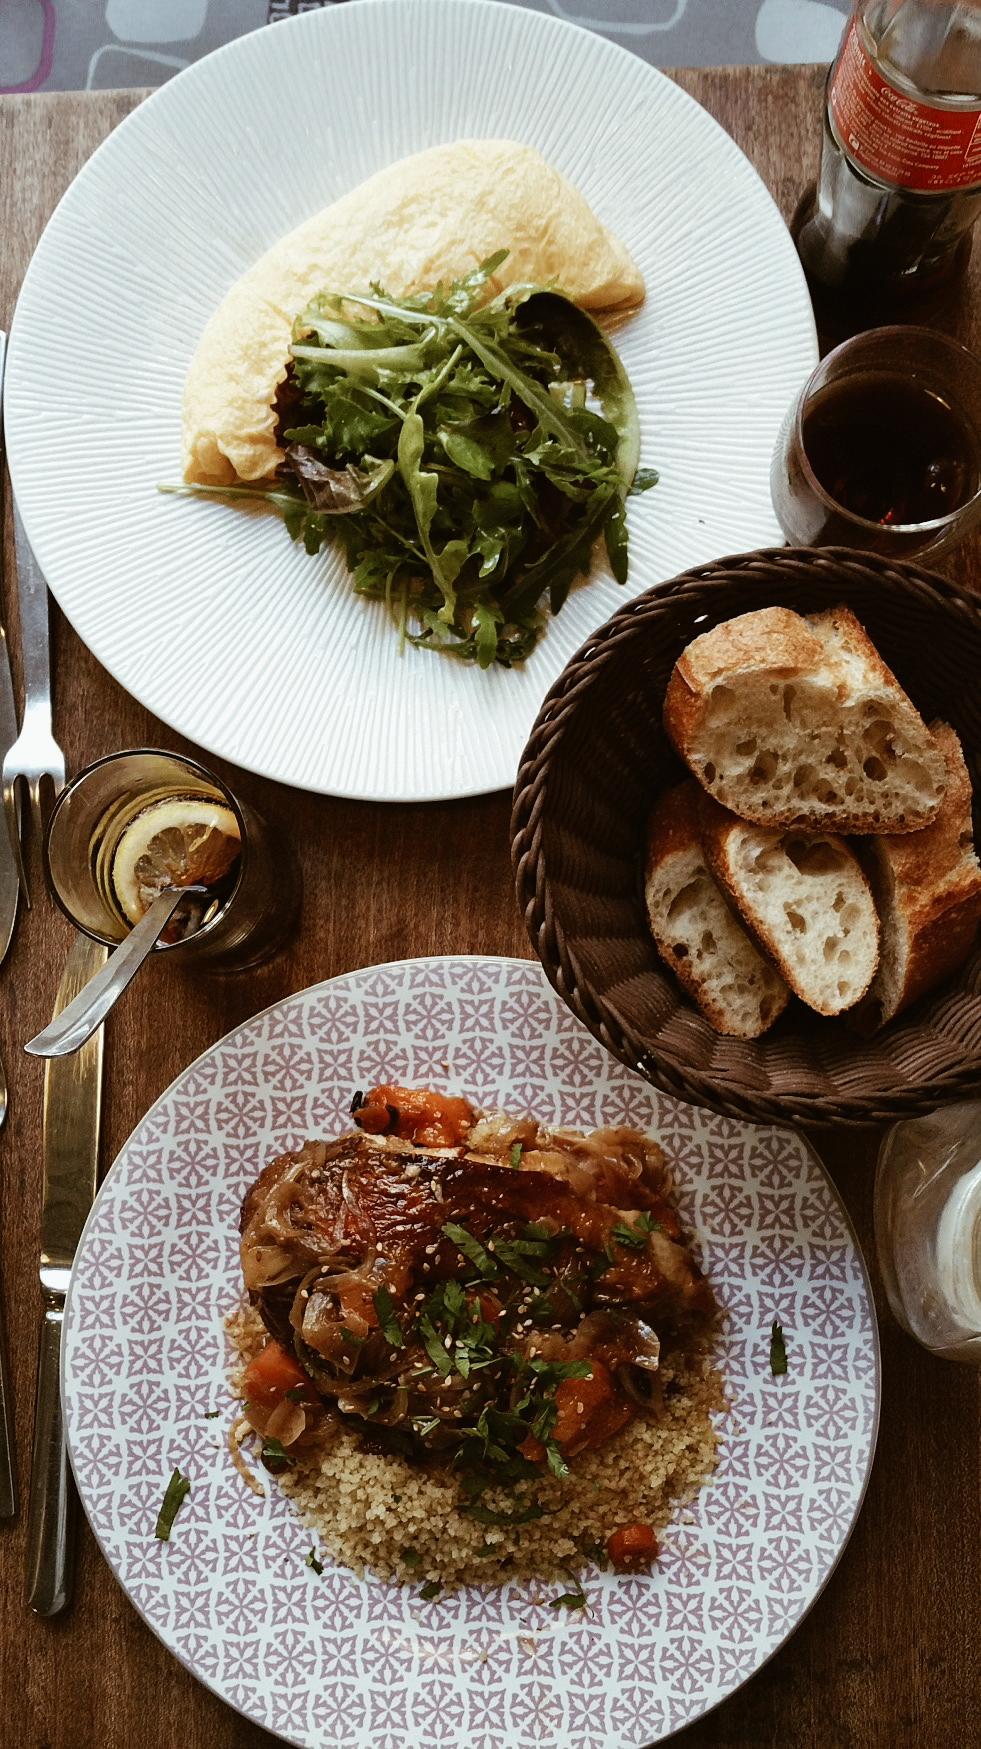 lunch-in-marais-paris-pintade-chicken